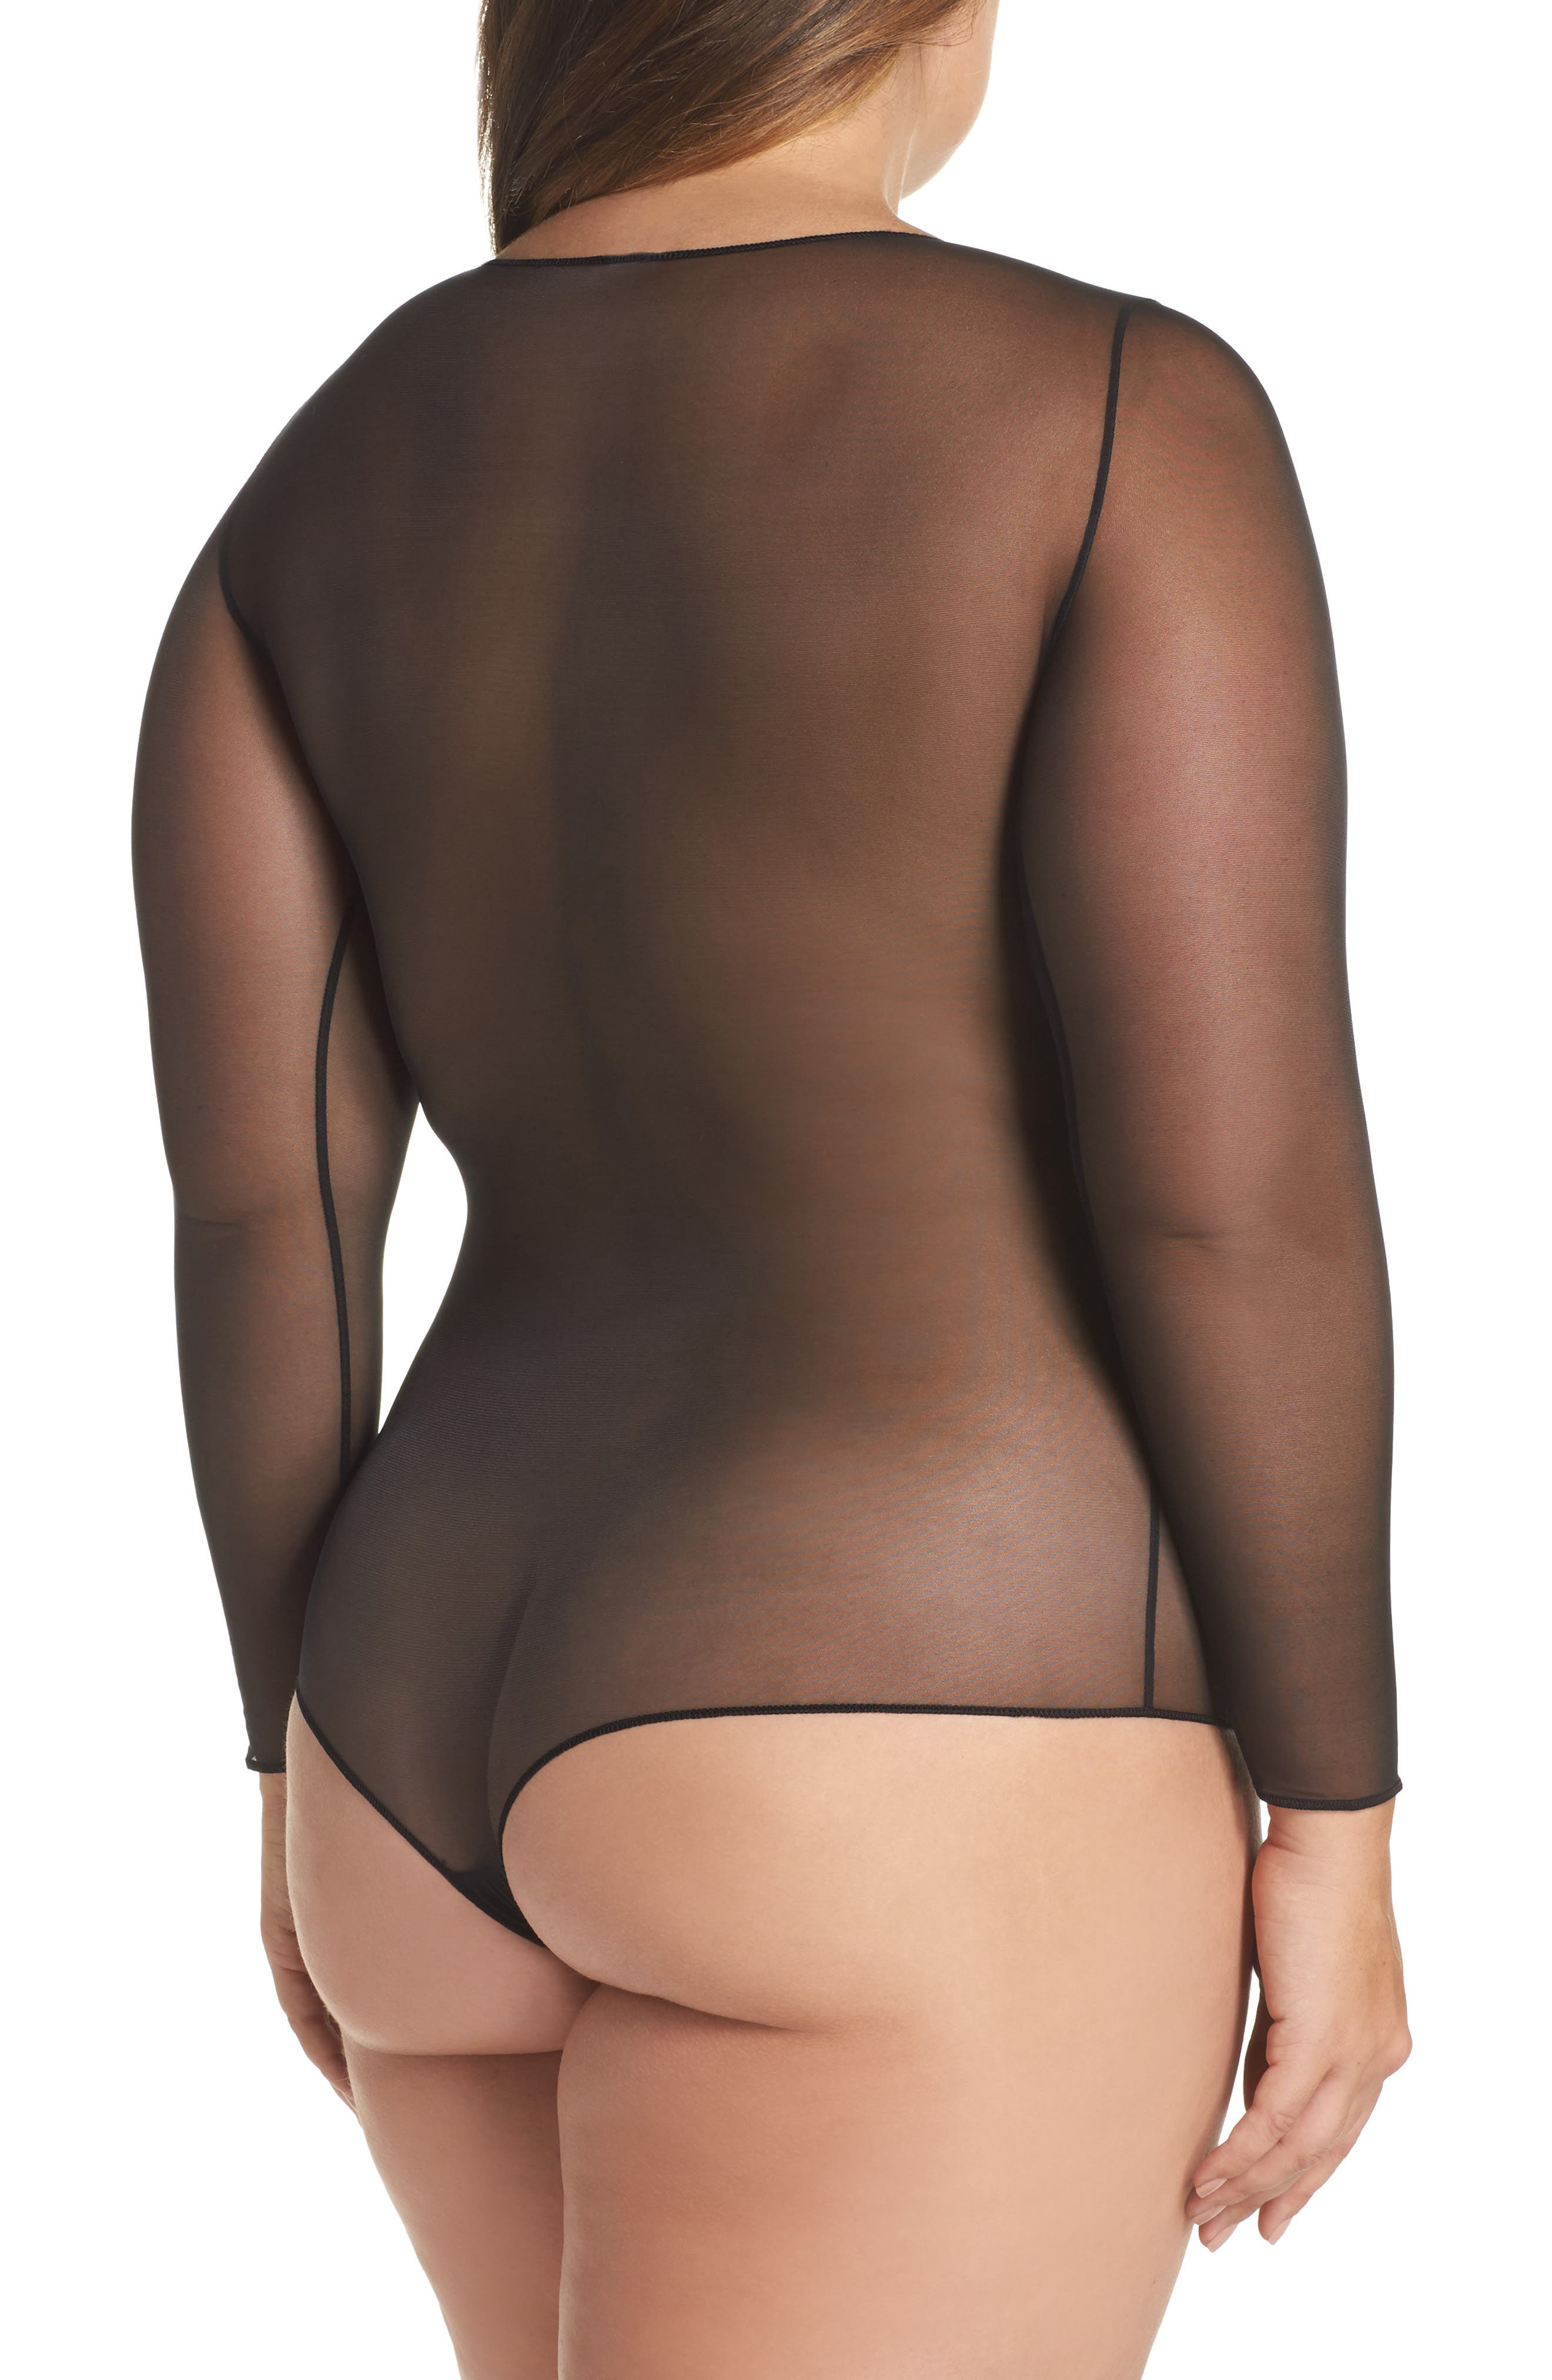 Thong Bodysuit,                             Alternate thumbnail 2, color,                             Very Black